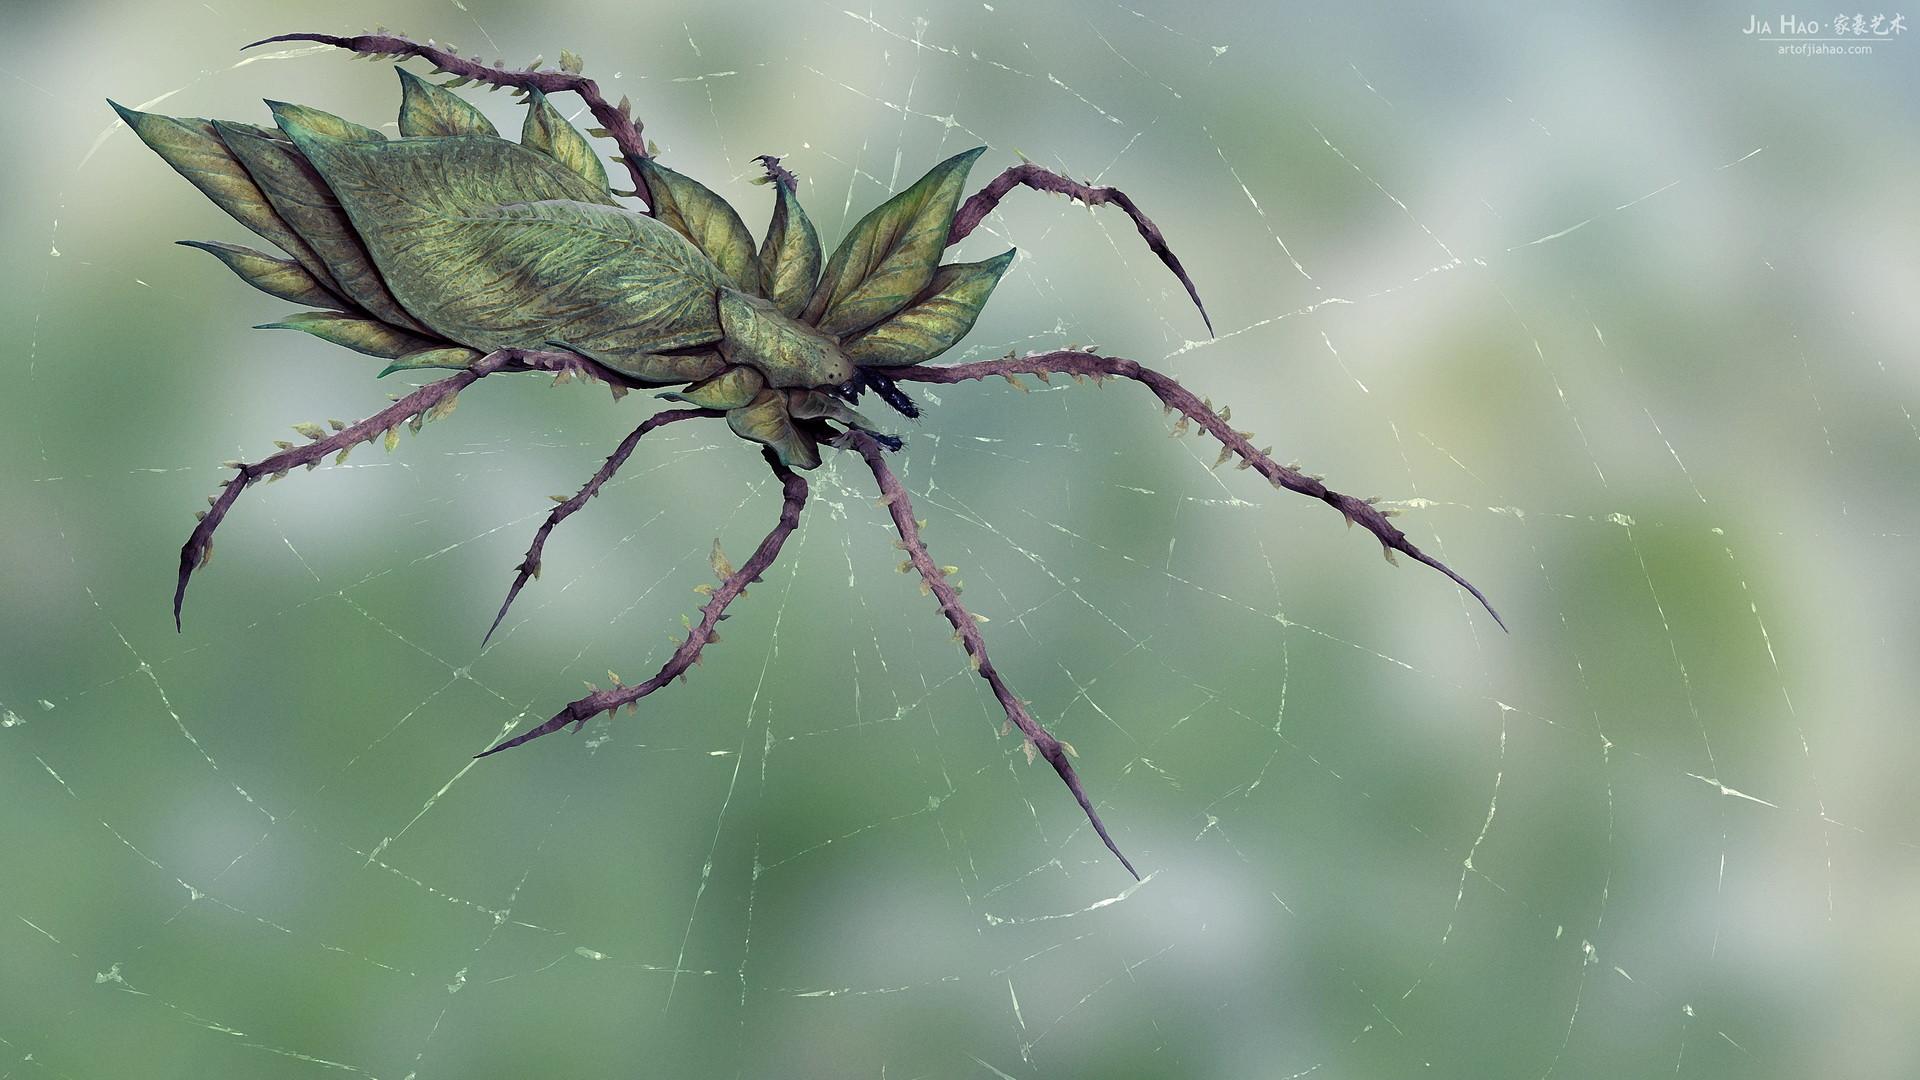 Jia hao 2017 leafyspider comp 01